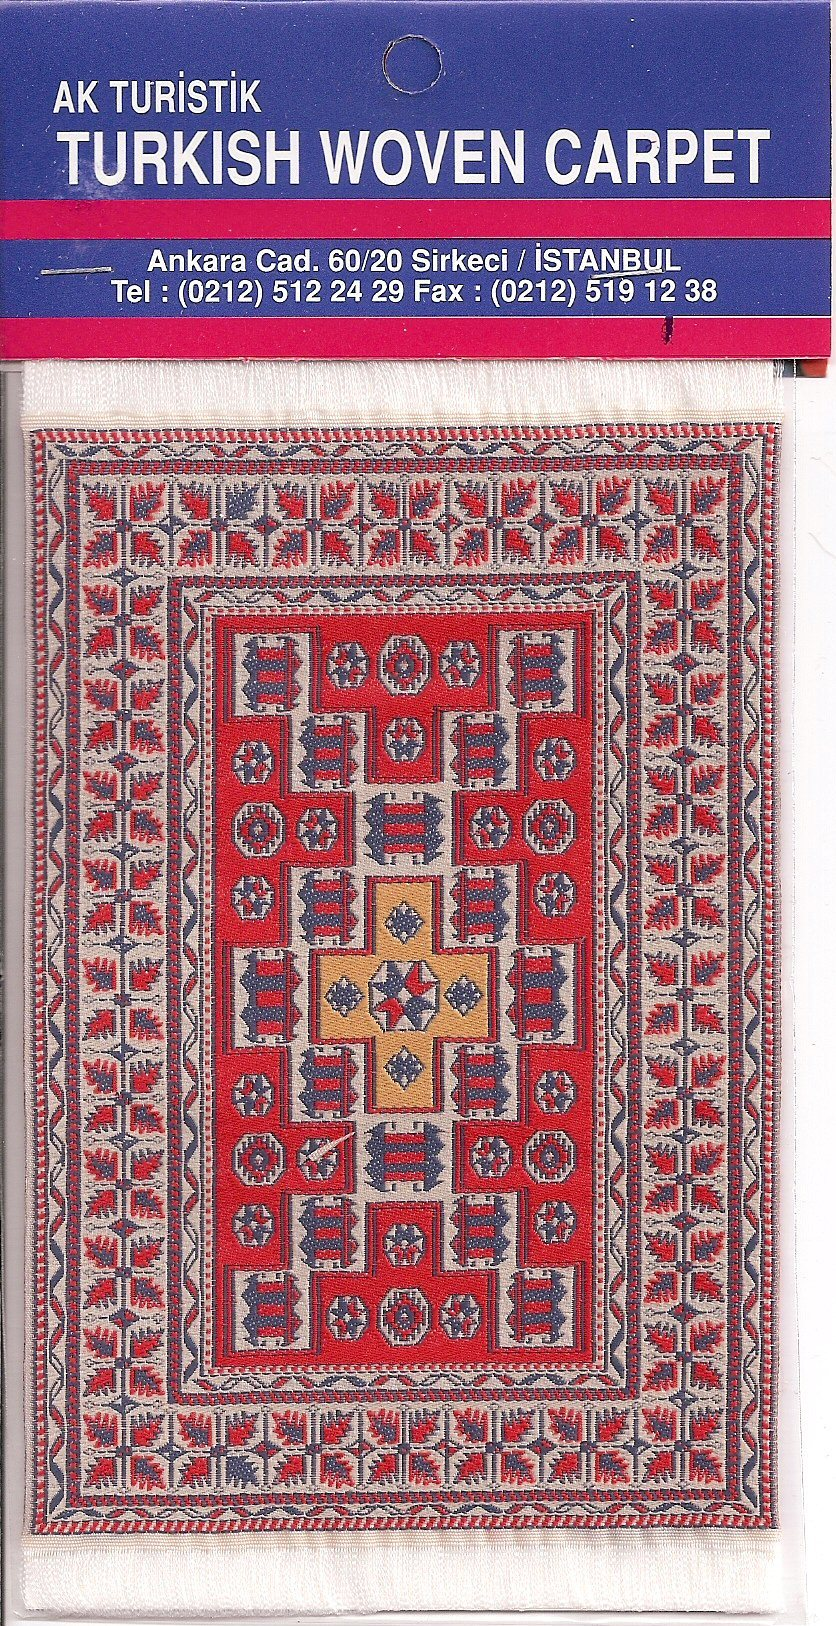 Miniature Turkish Woven Carpet Pipe Felt Blue Red Ivory